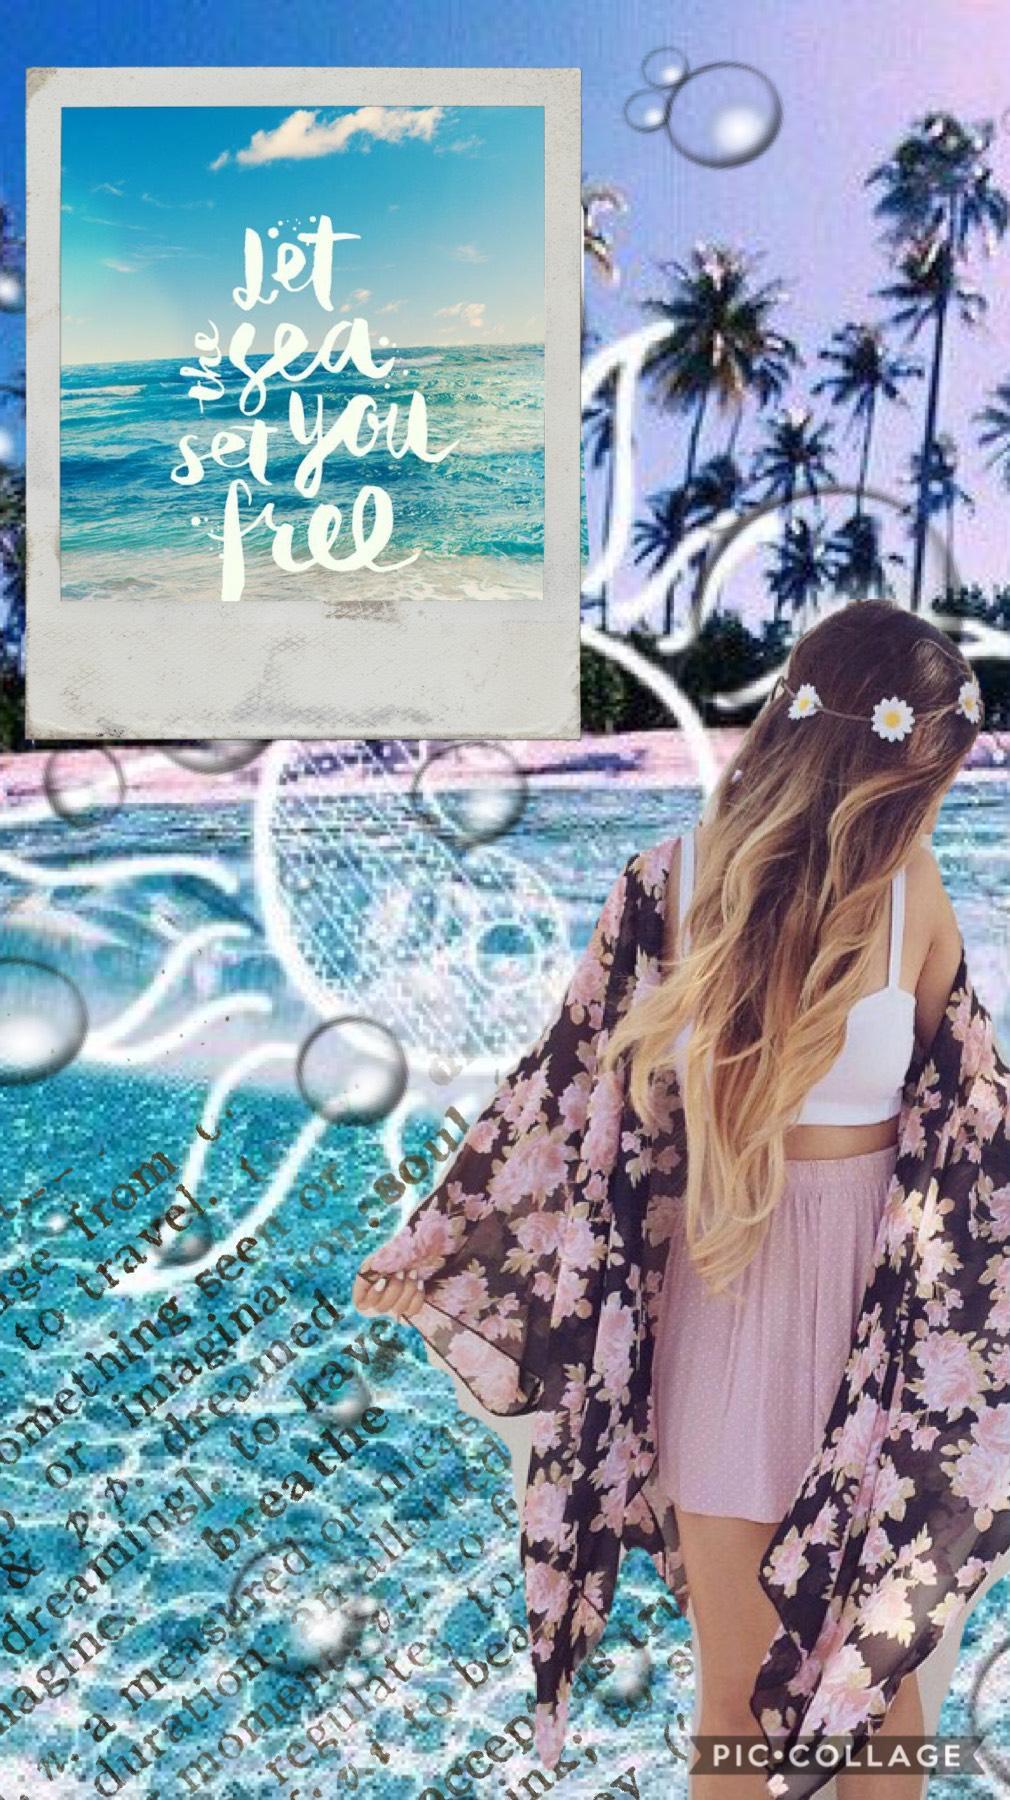 Collage by Xx_BlueLemons_xX